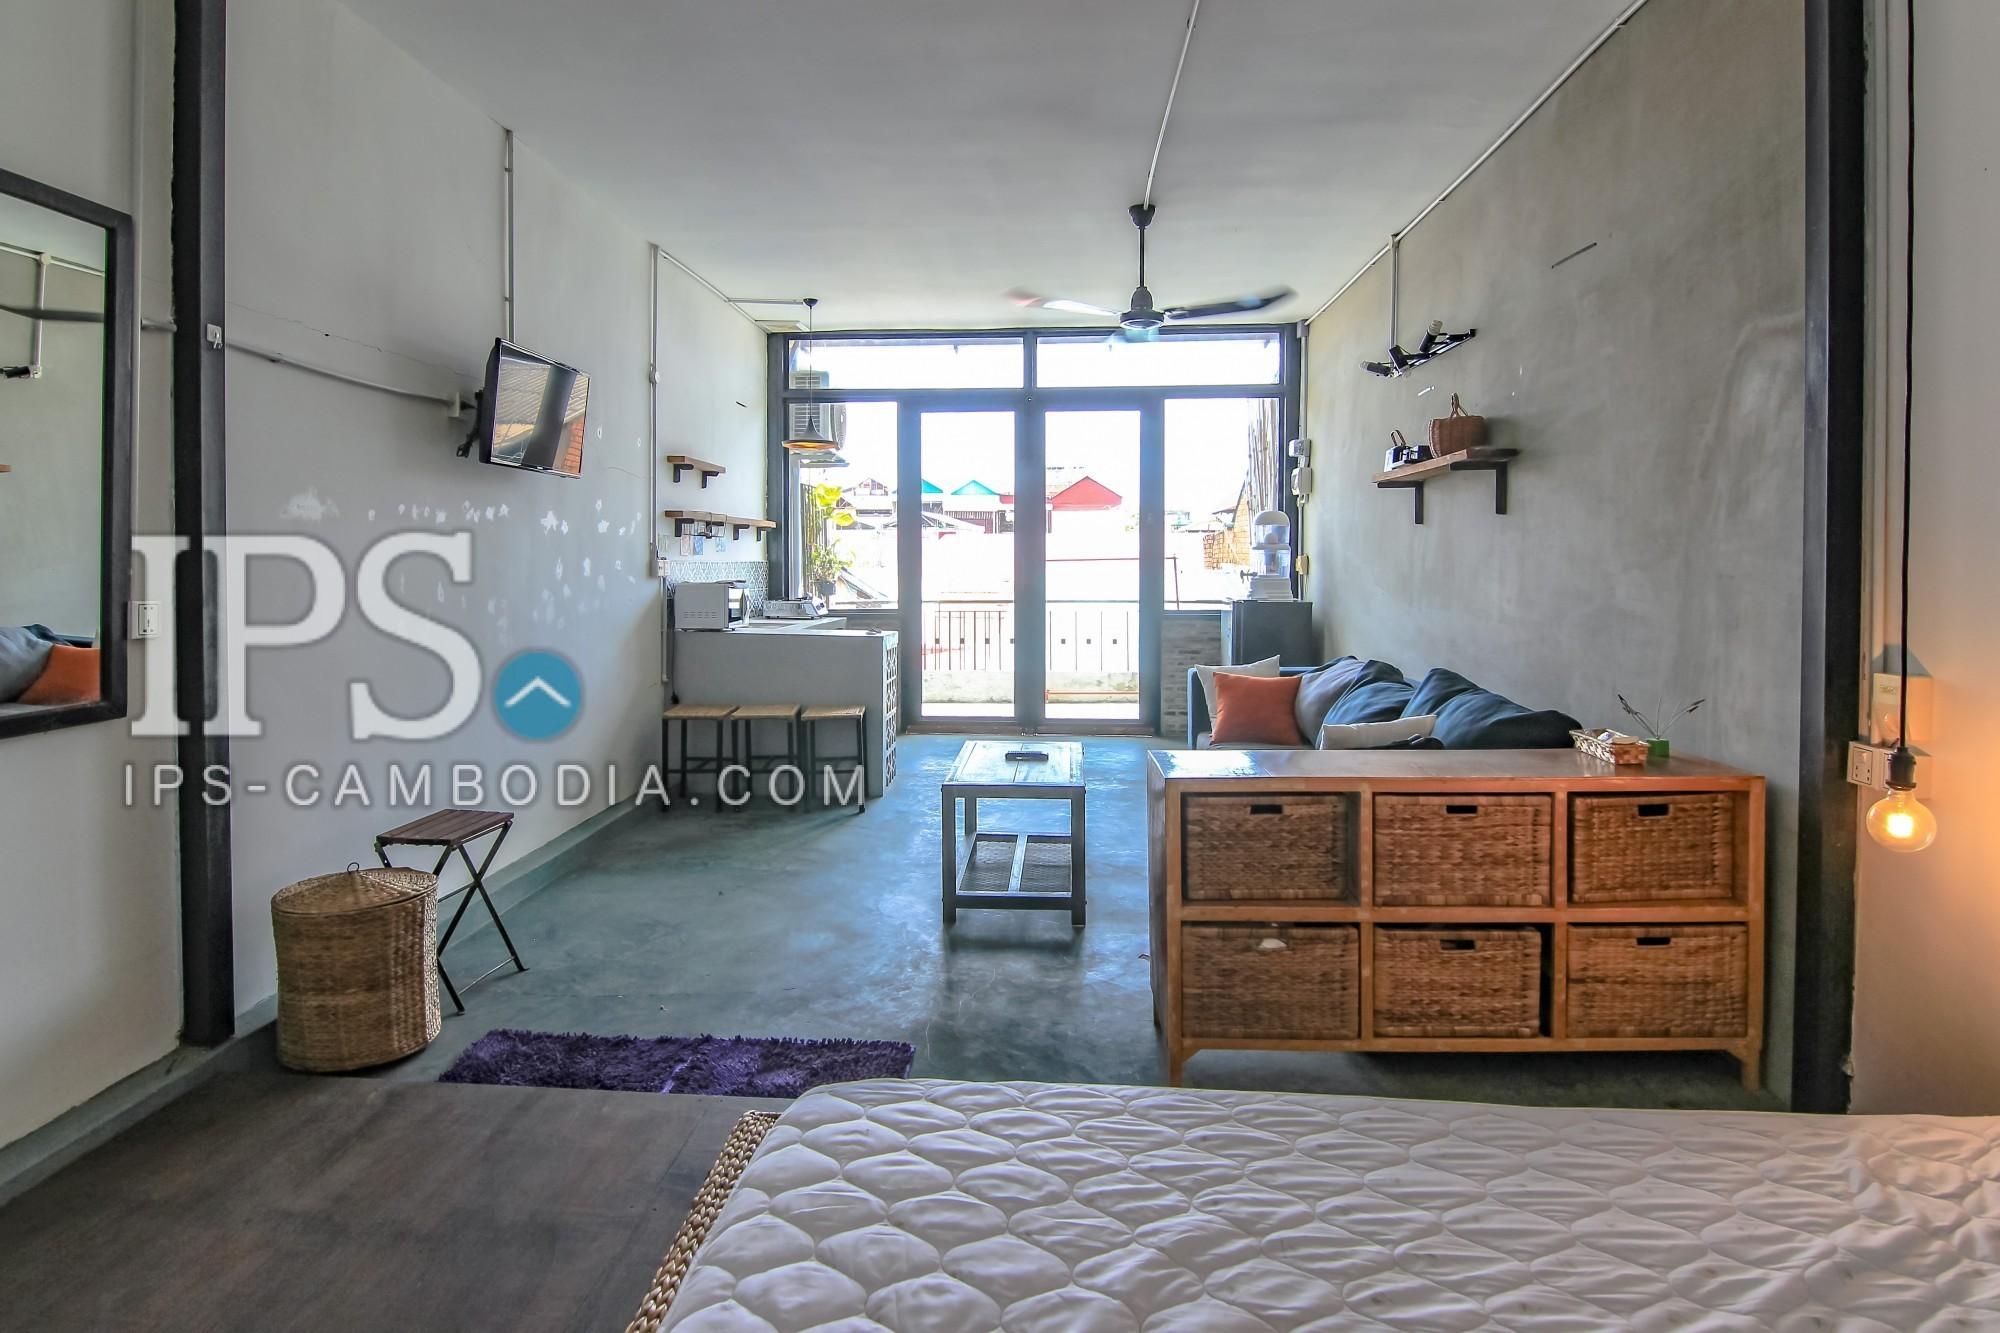 Studio room Apartment  For Rent - Riverside, Phnom Penh